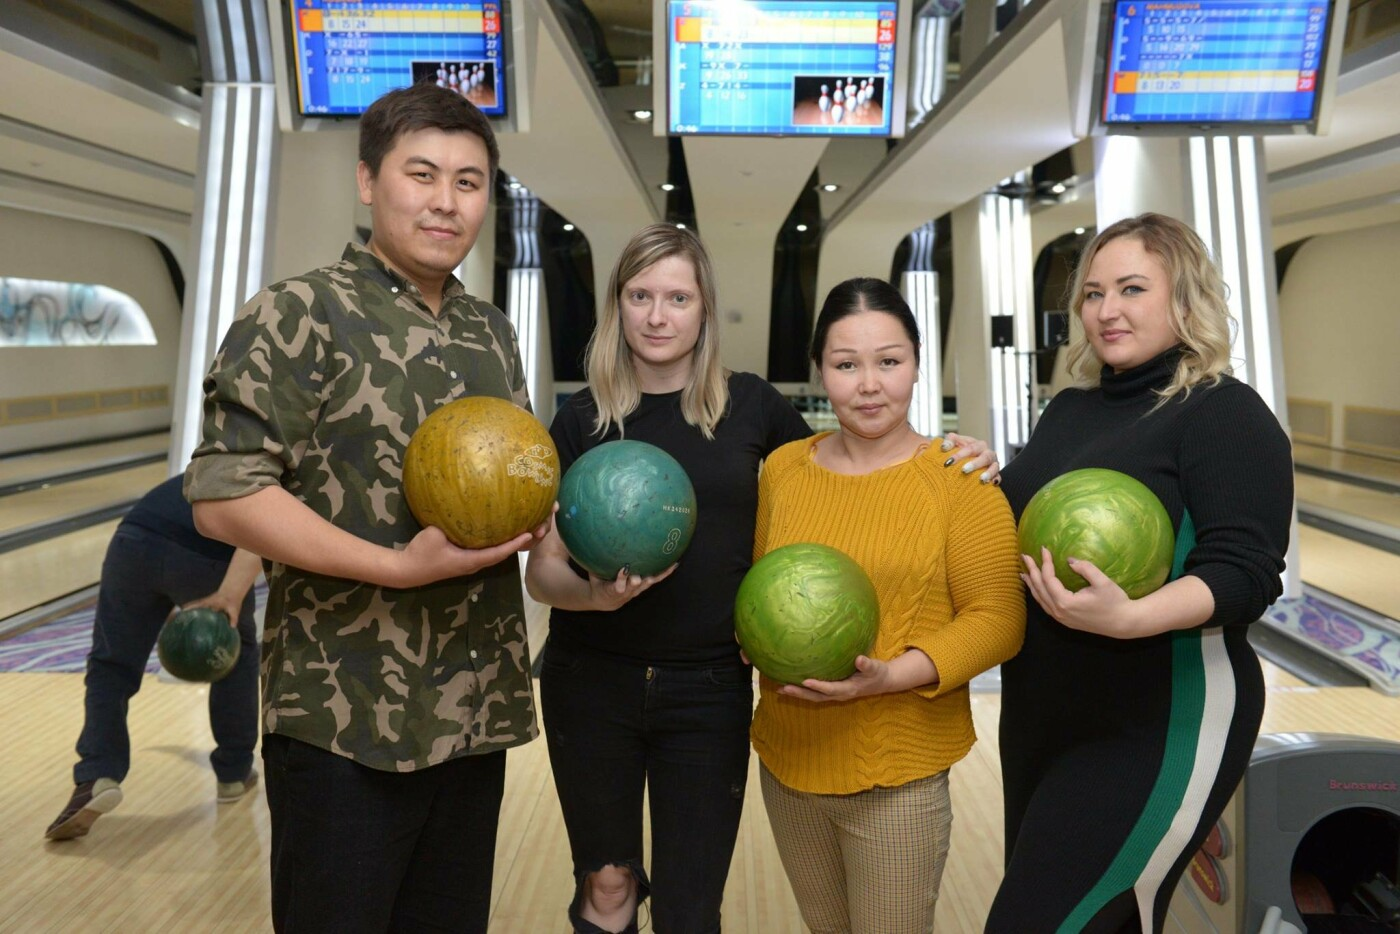 II турнир по боулингу среди журналистов прошел в Алматы (ФОТО), фото-26